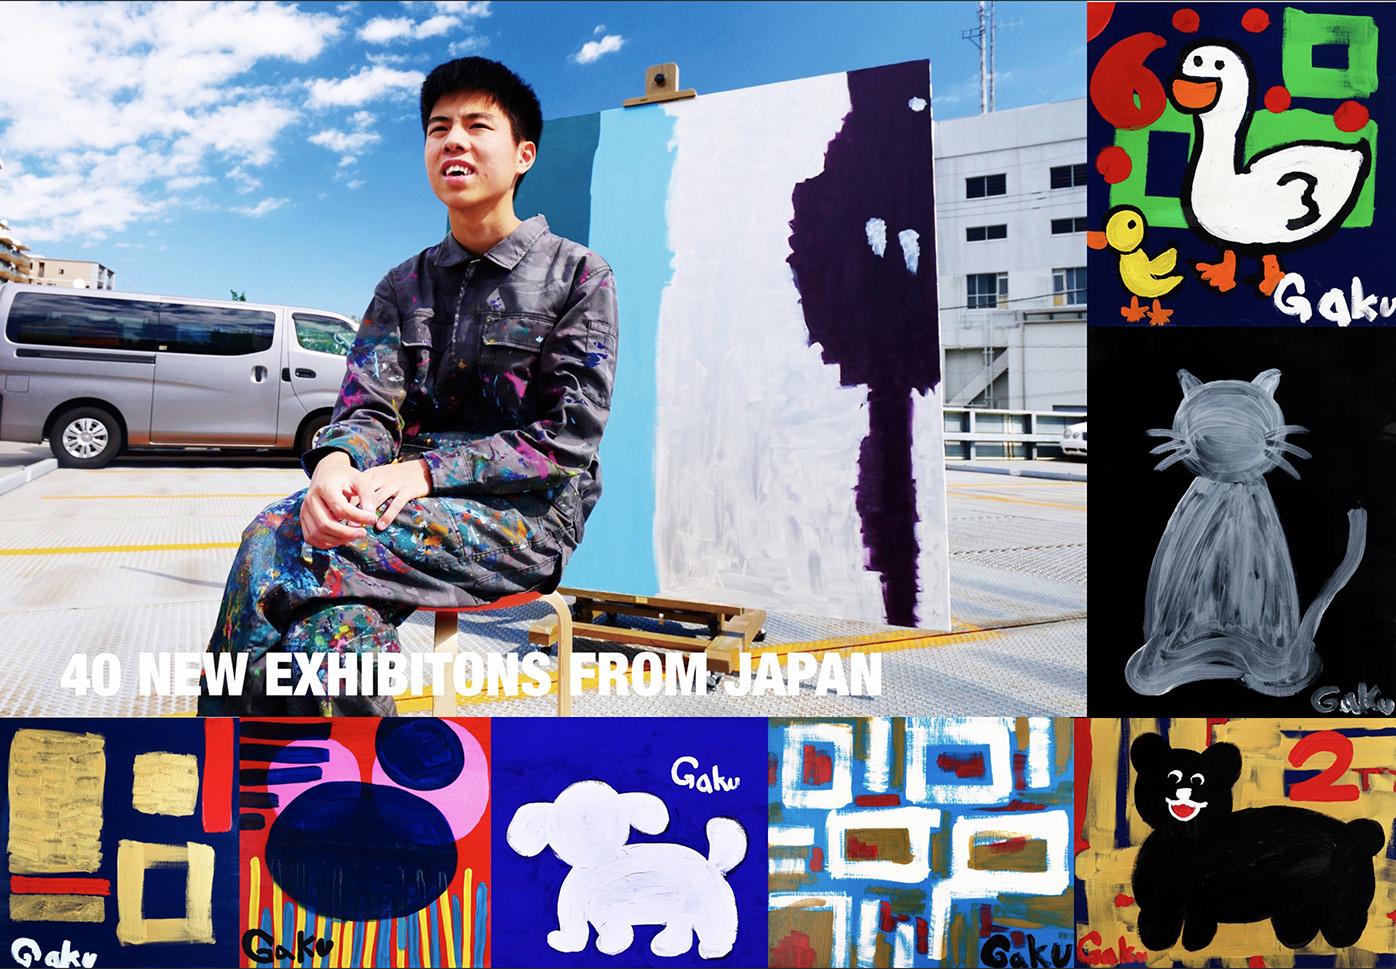 gaku postcard